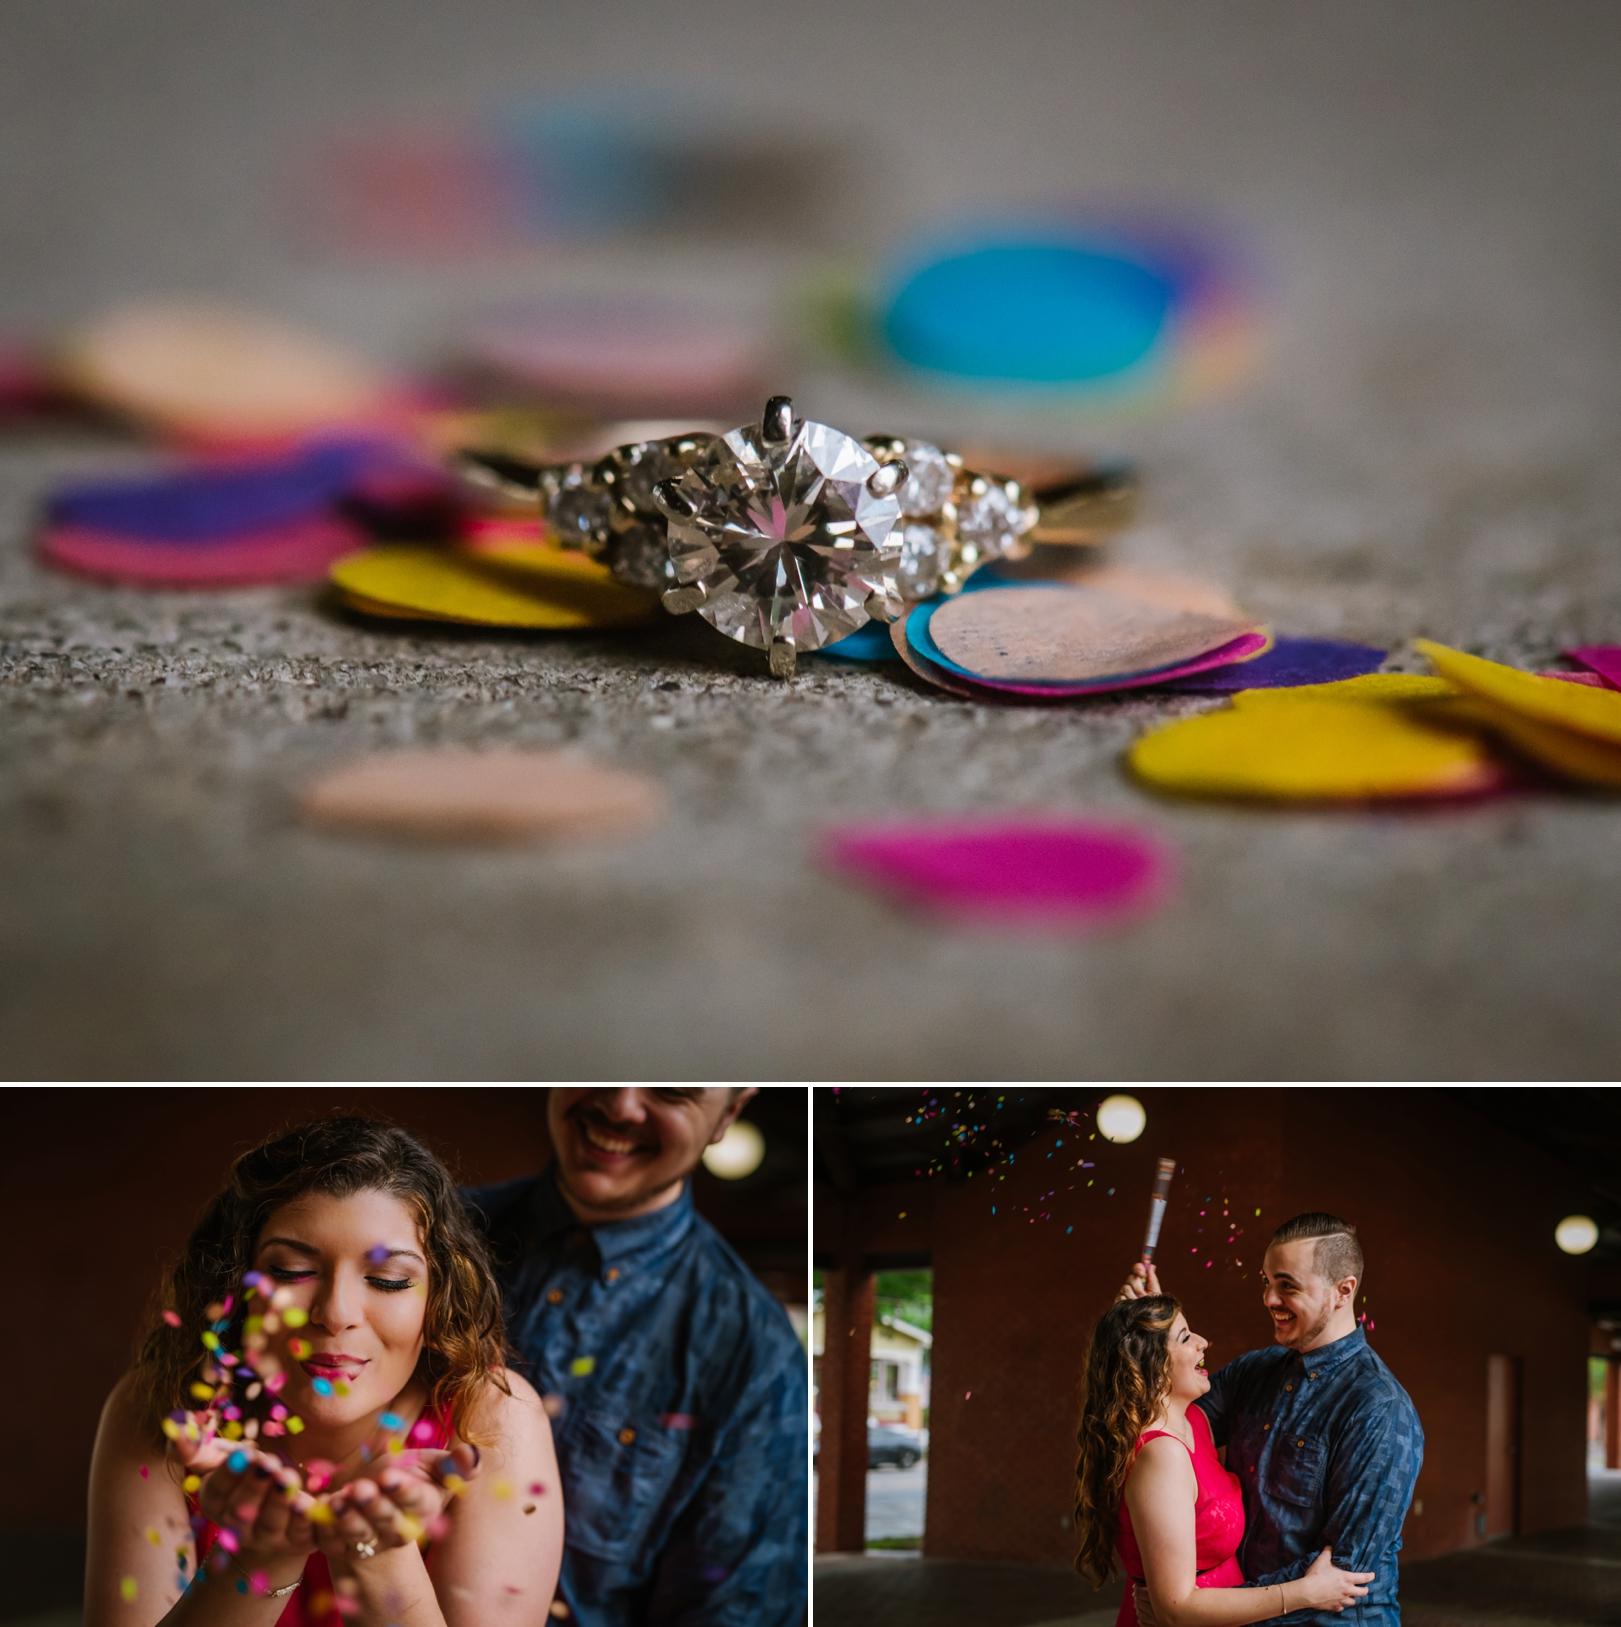 ashlee-hamon-wedding-photography-tampa-urban-cafe-engagement_0006.jpg